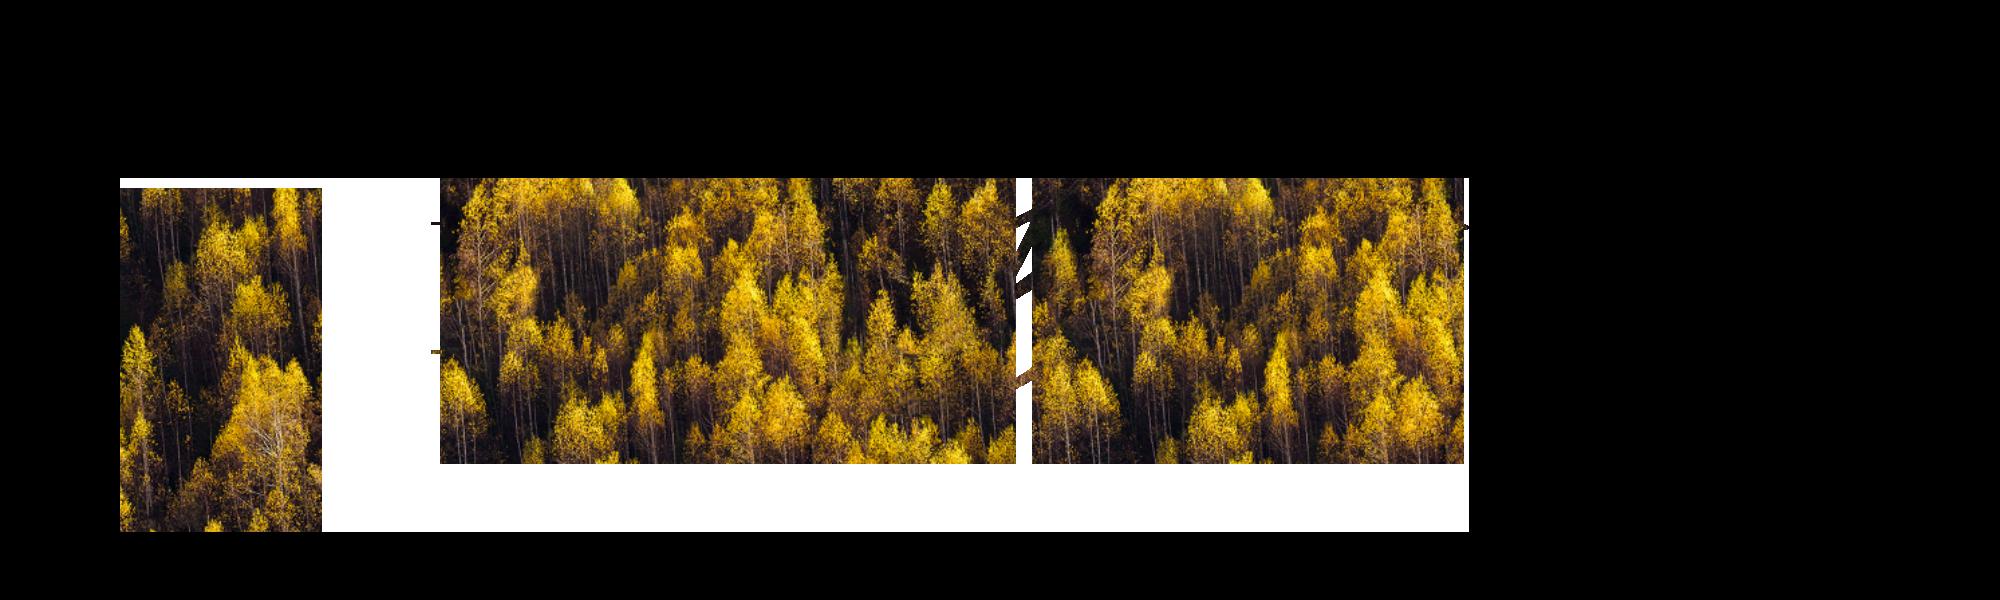 Brigitte Bellet